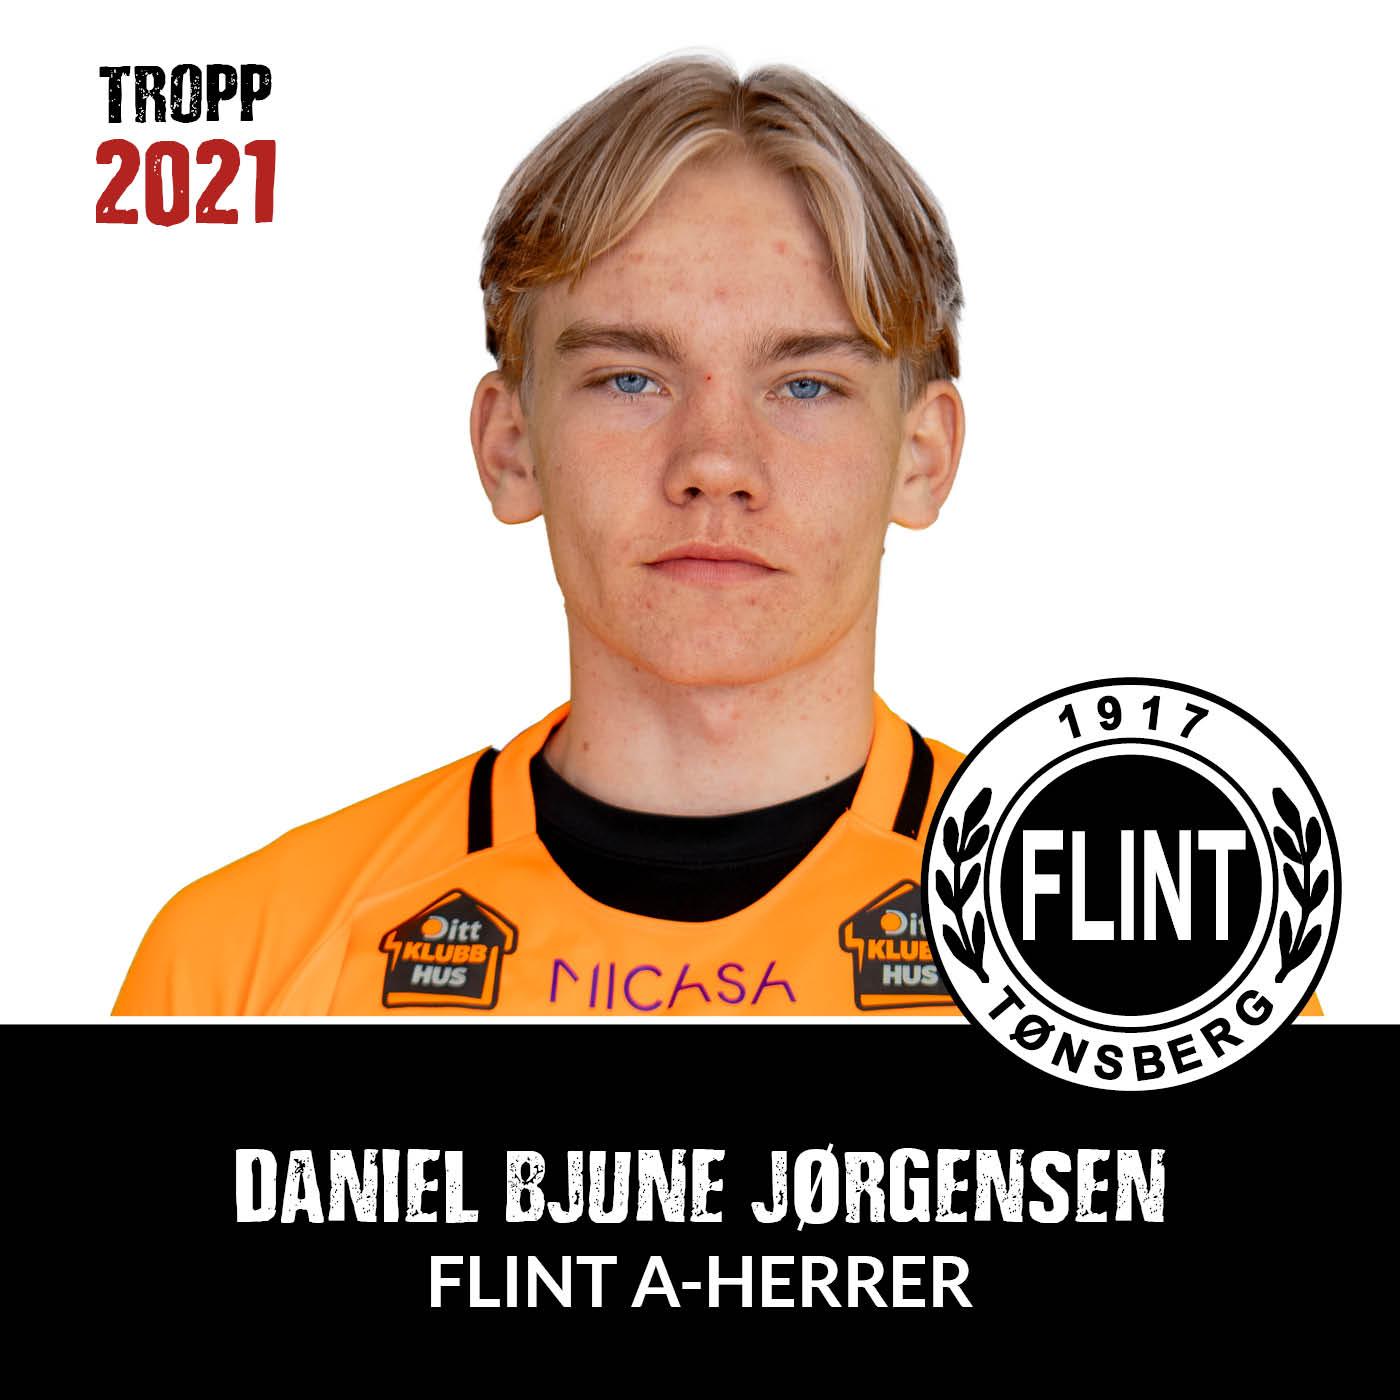 https://www.flintfotball.no/wp-content/uploads/2021/01/A-herrer-2021-Daniel-Bjune-Jorgensen.jpg